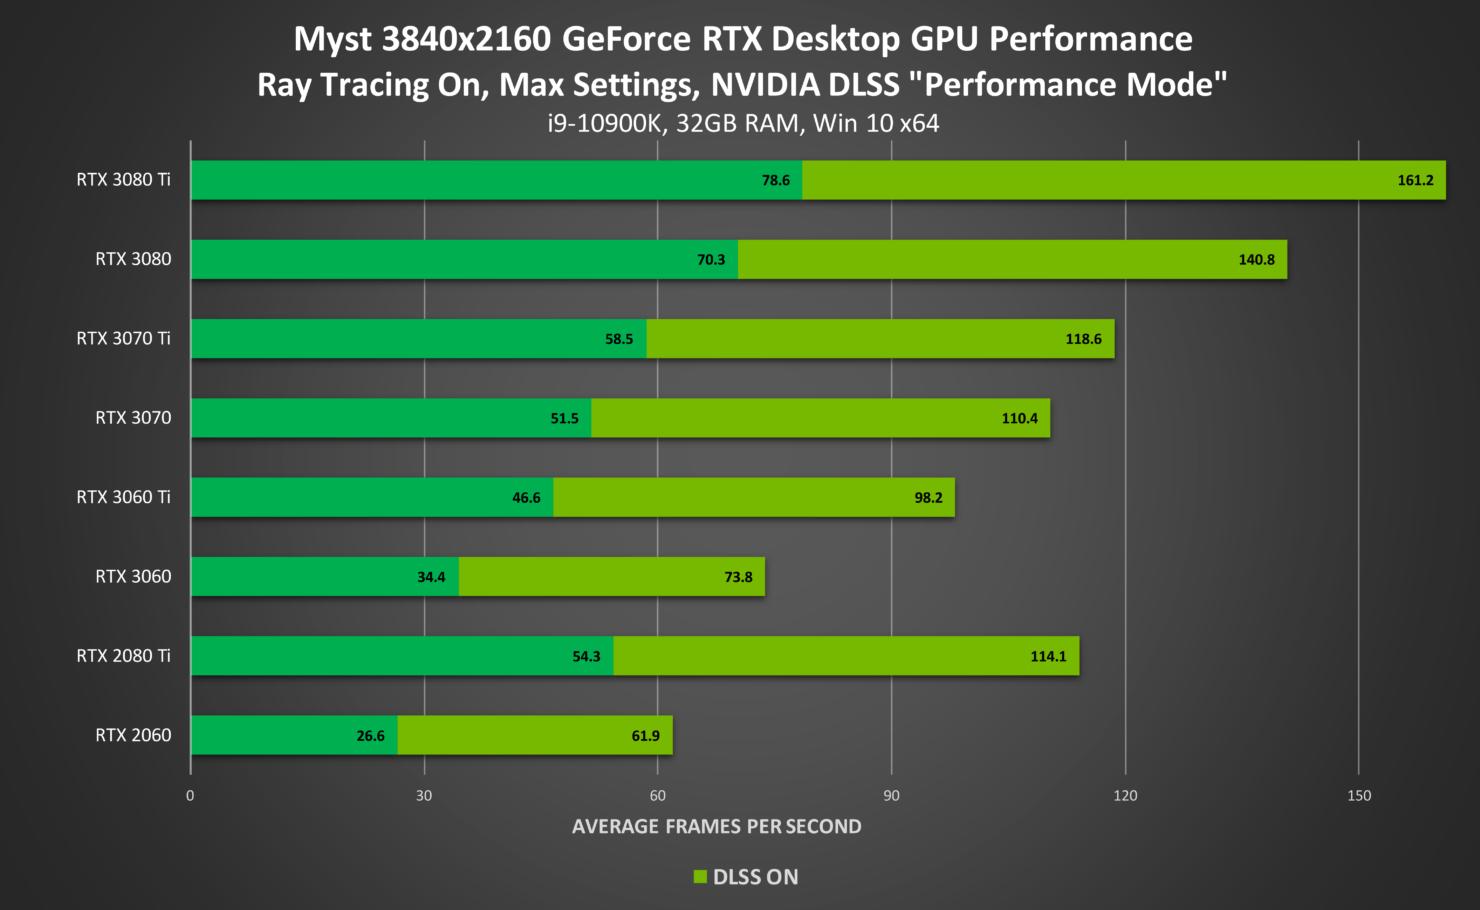 myst-geforce-rtx-3840x2160-ray-tracing-on-nvidia-dlss-desktop-gpu-performance-2